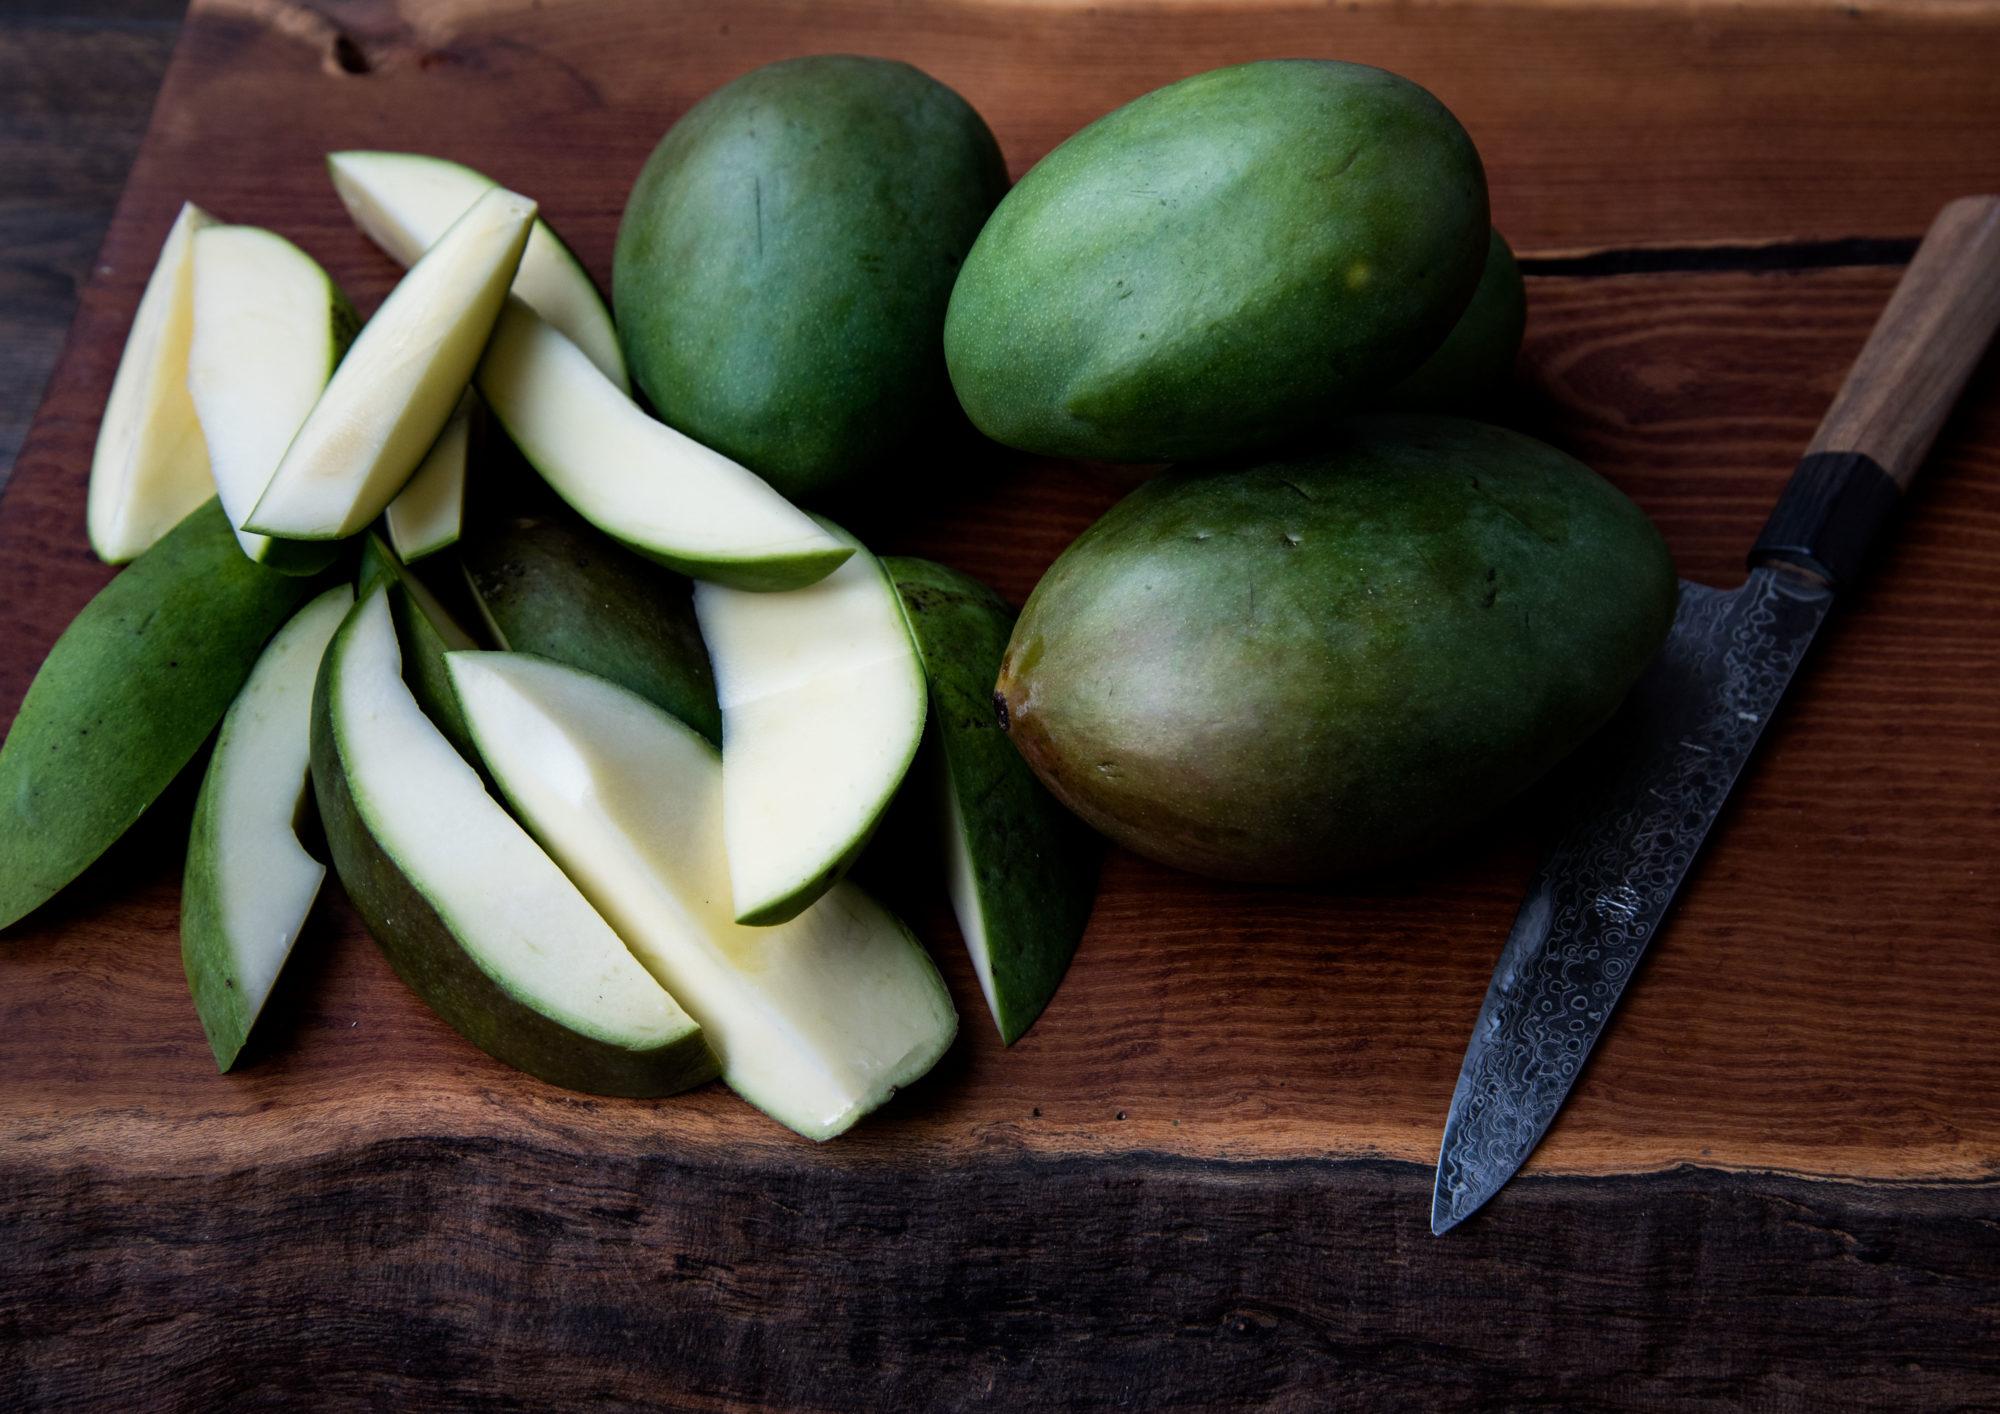 Green-Mango-7399